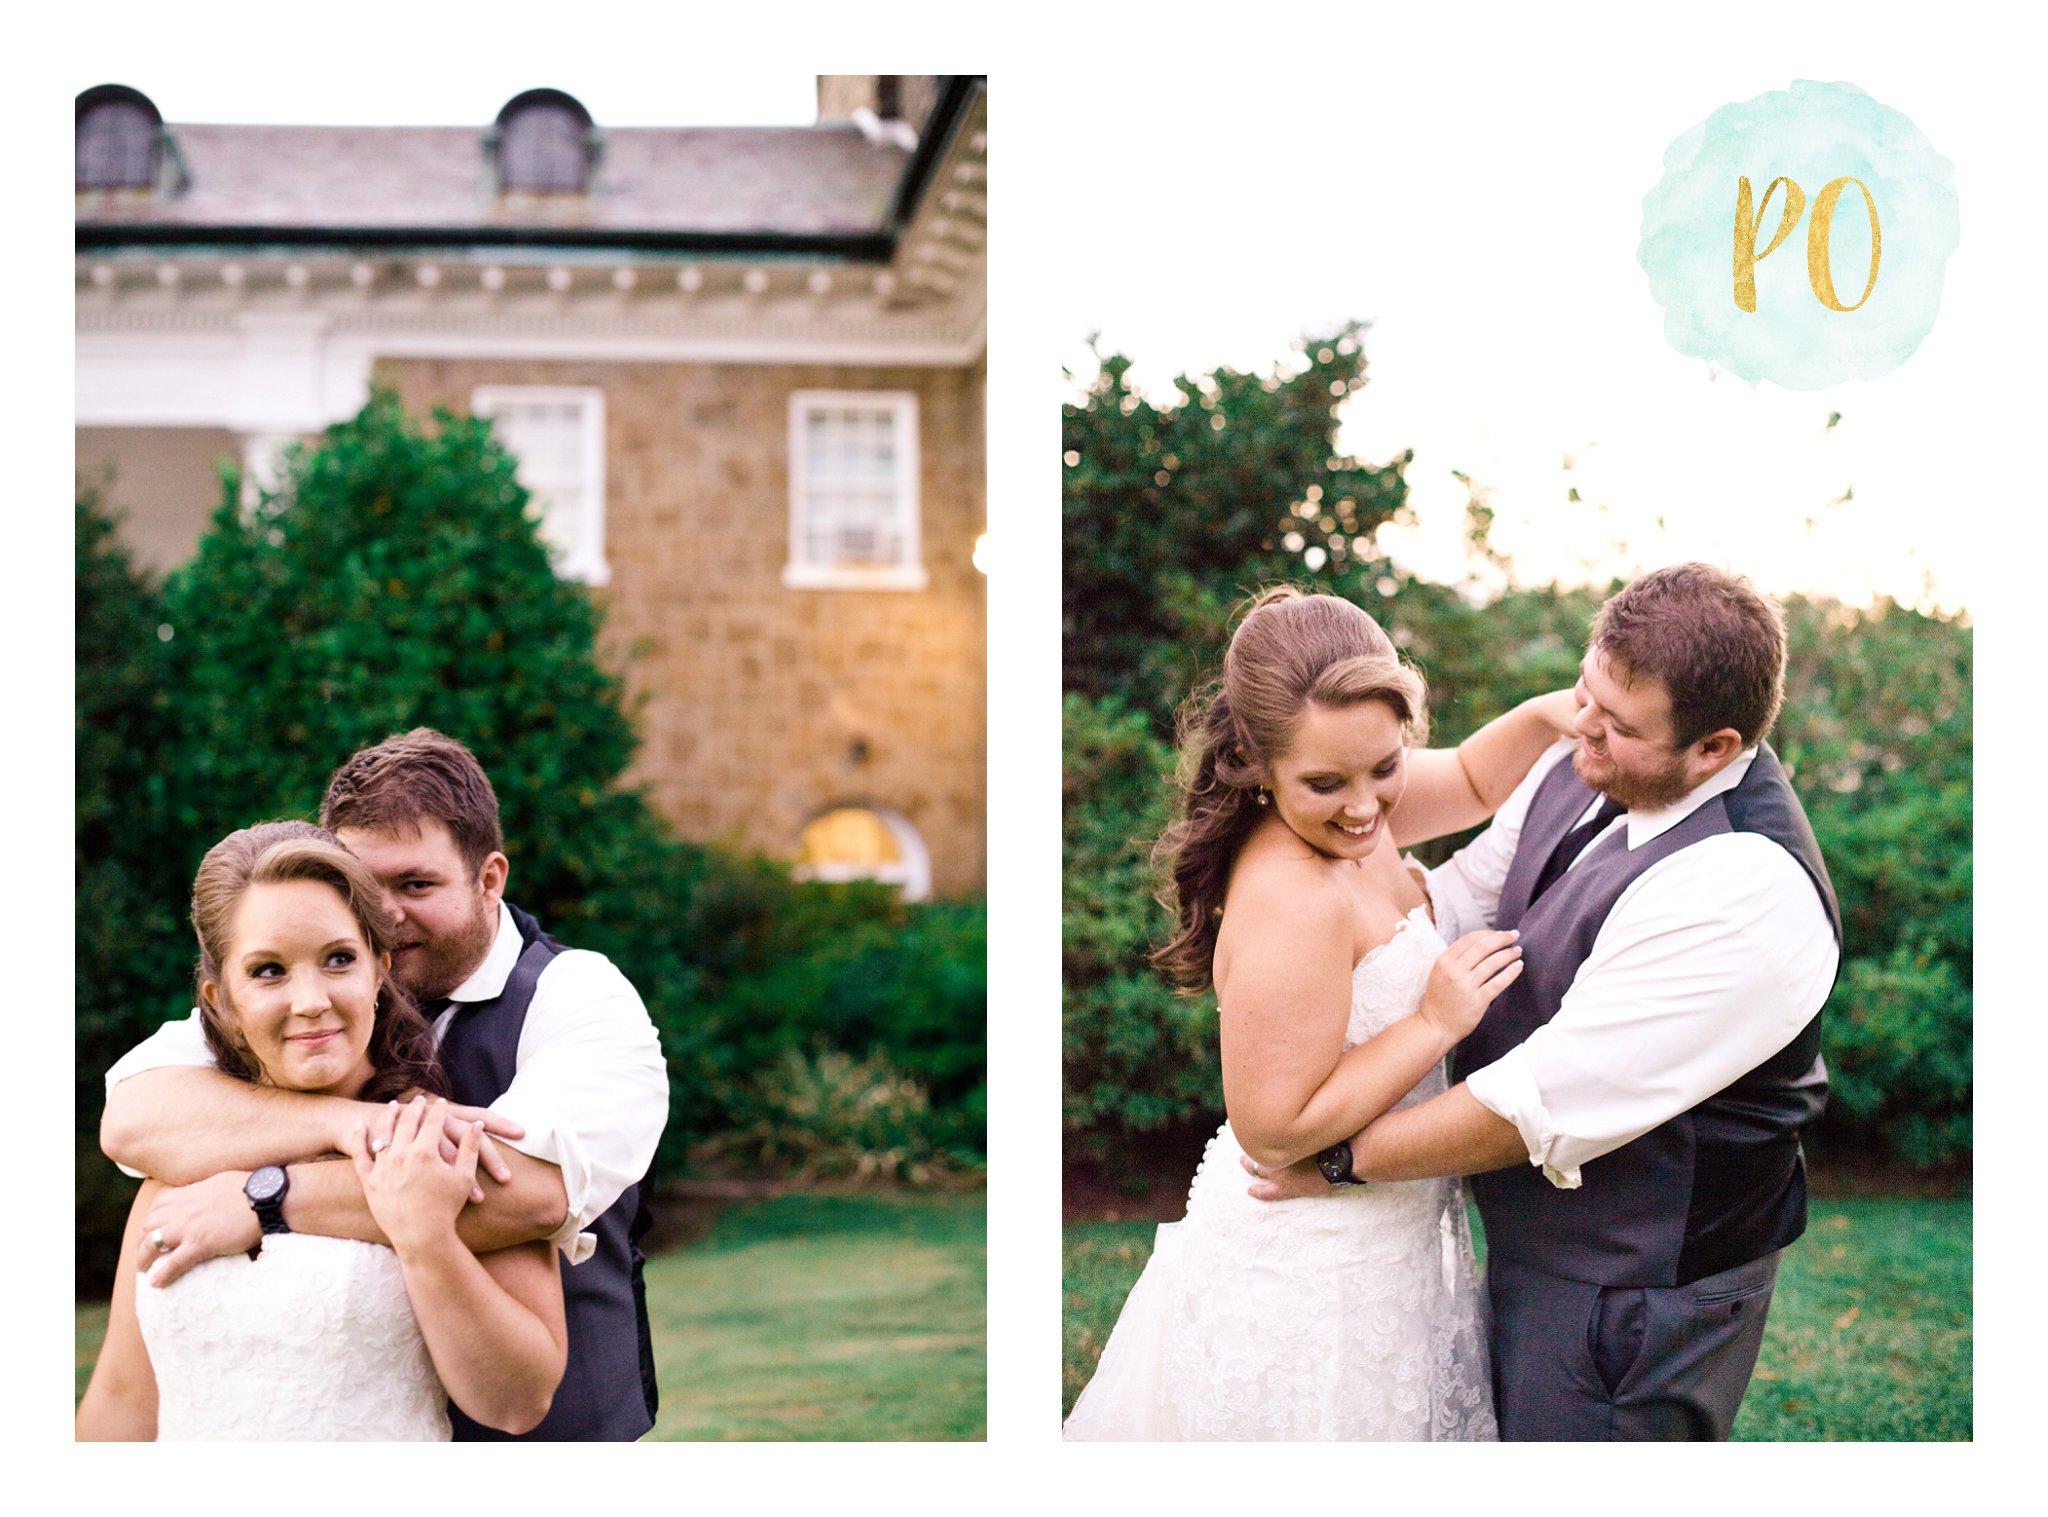 gassaway-mansion-fall-wedding-greenvile-sc-photos_0050.jpg